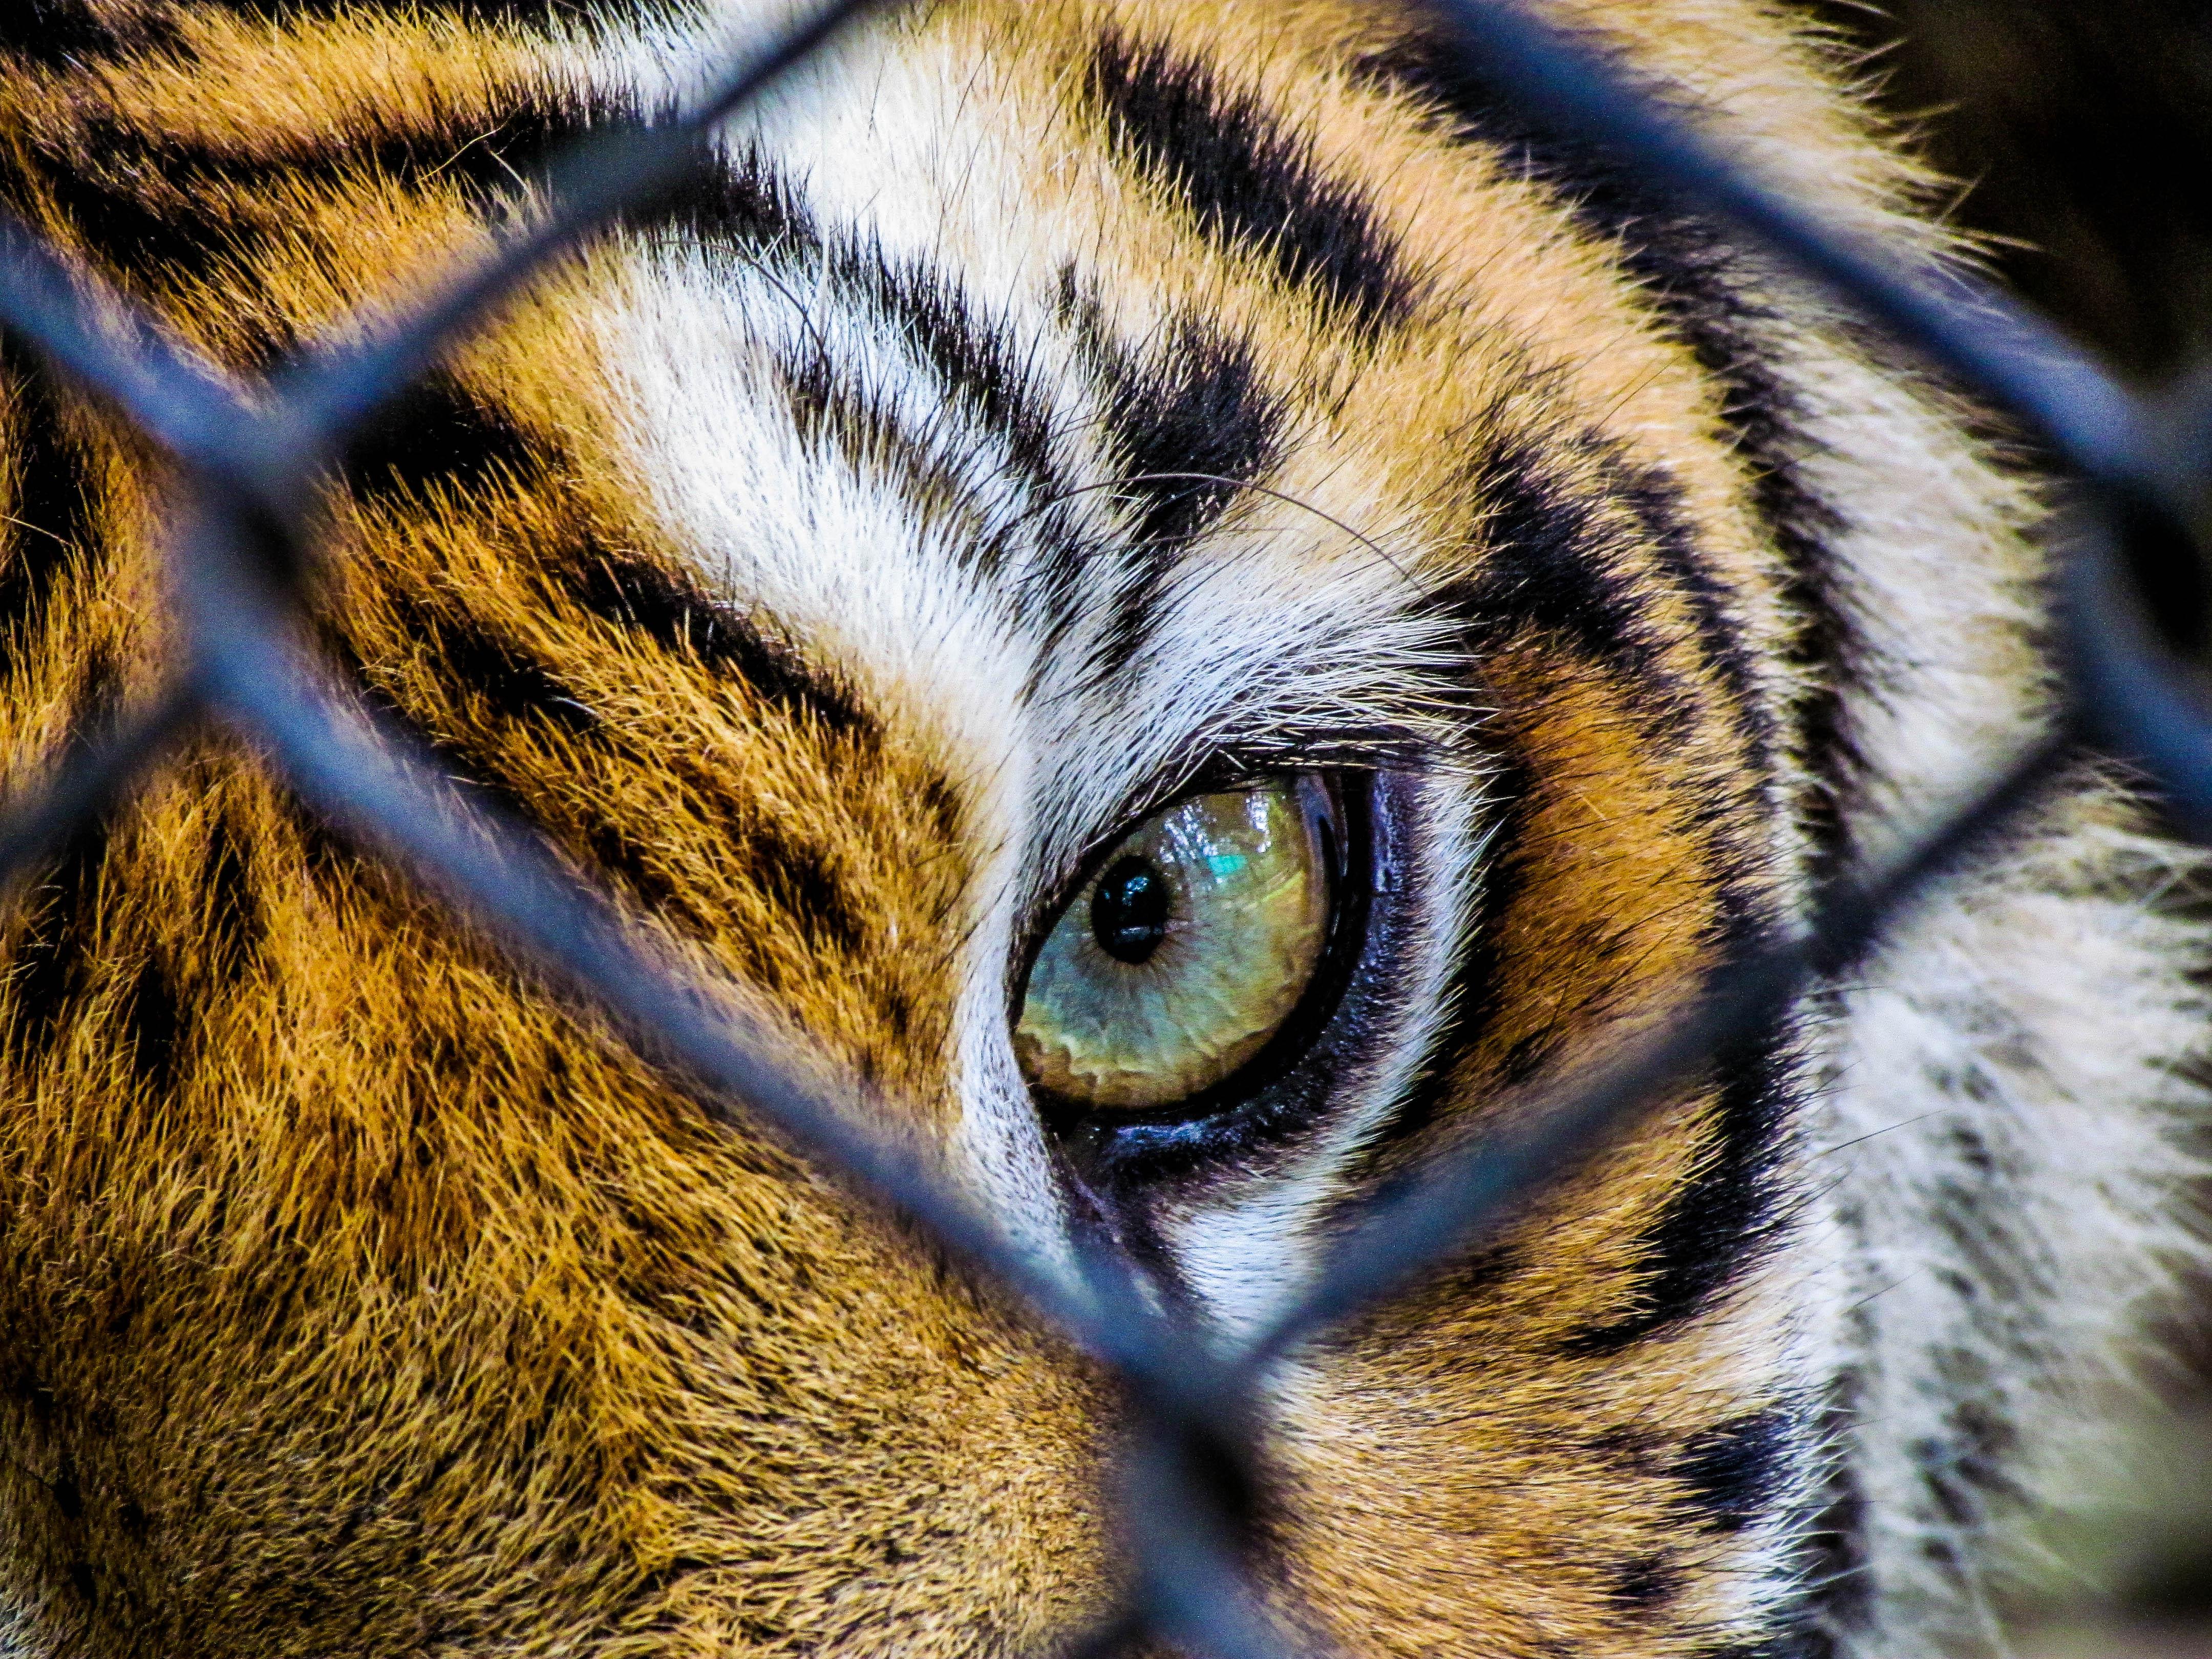 helm tigers eye repeat - HD4320×3240